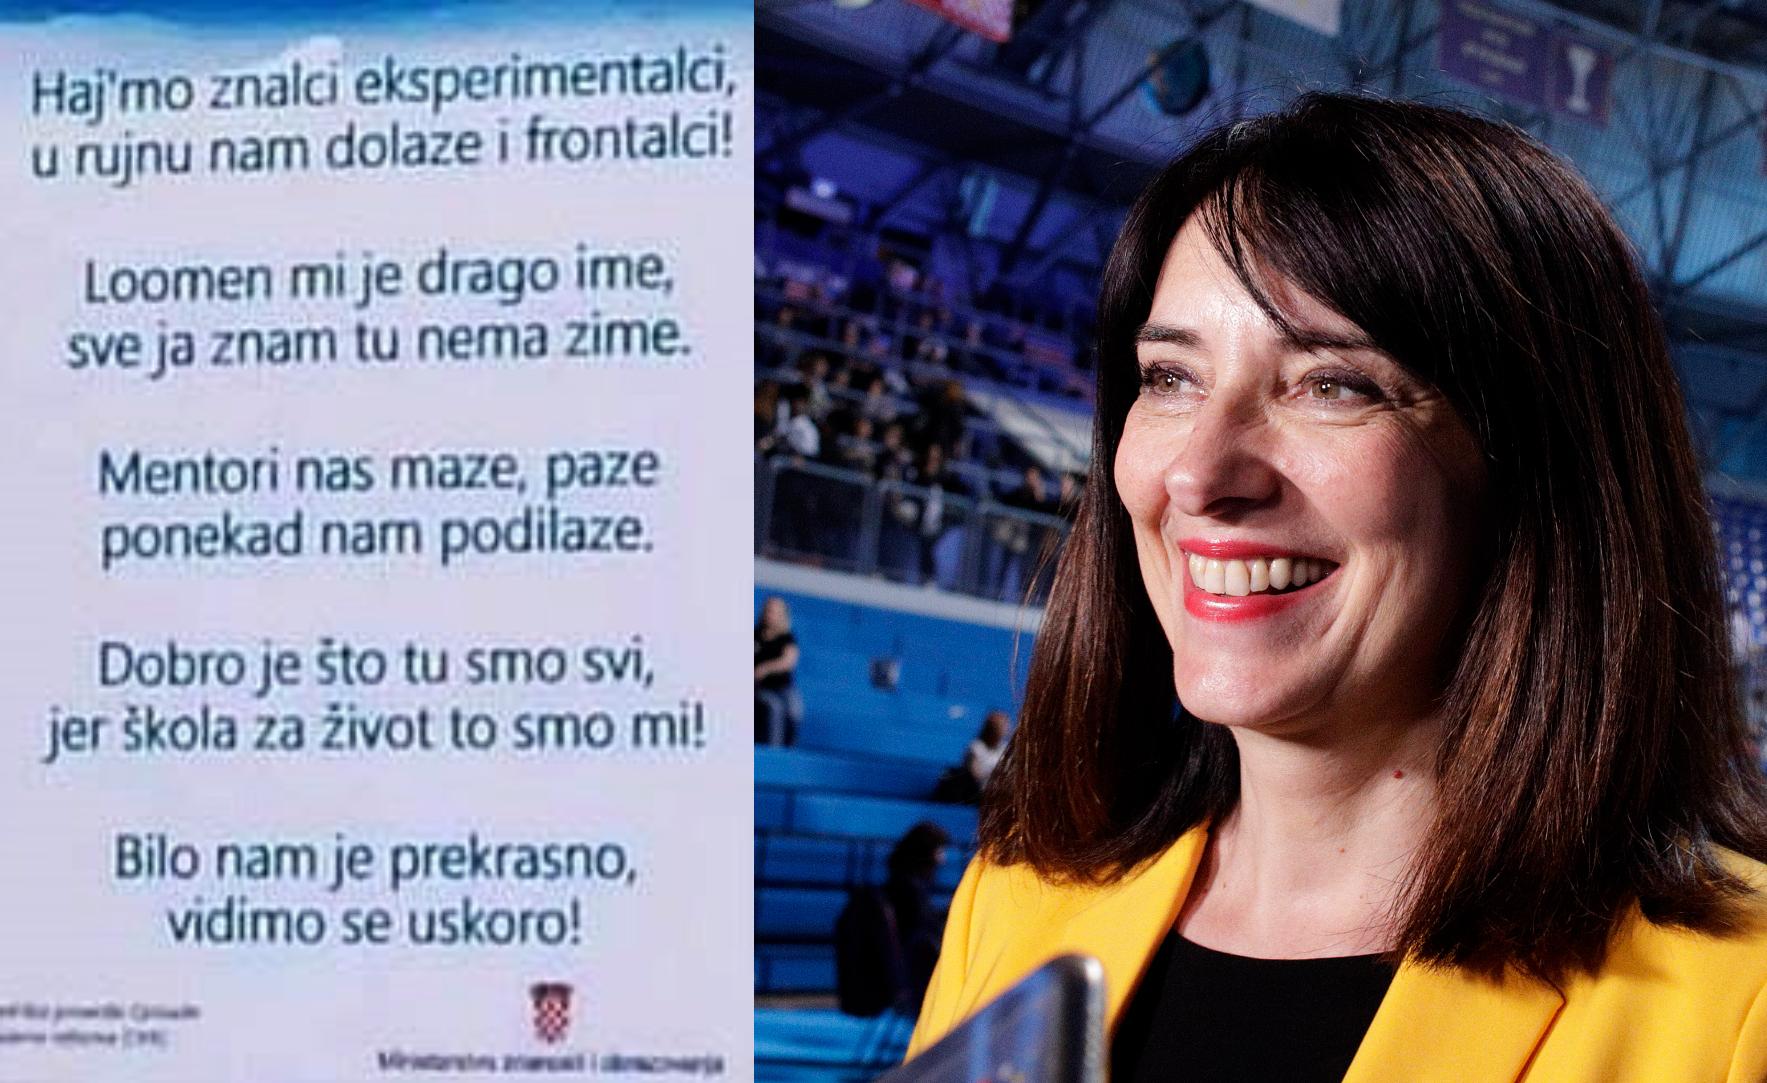 http://hrvatskifokus-2021.ga/wp-content/uploads/2019/04/Divjak.jpg